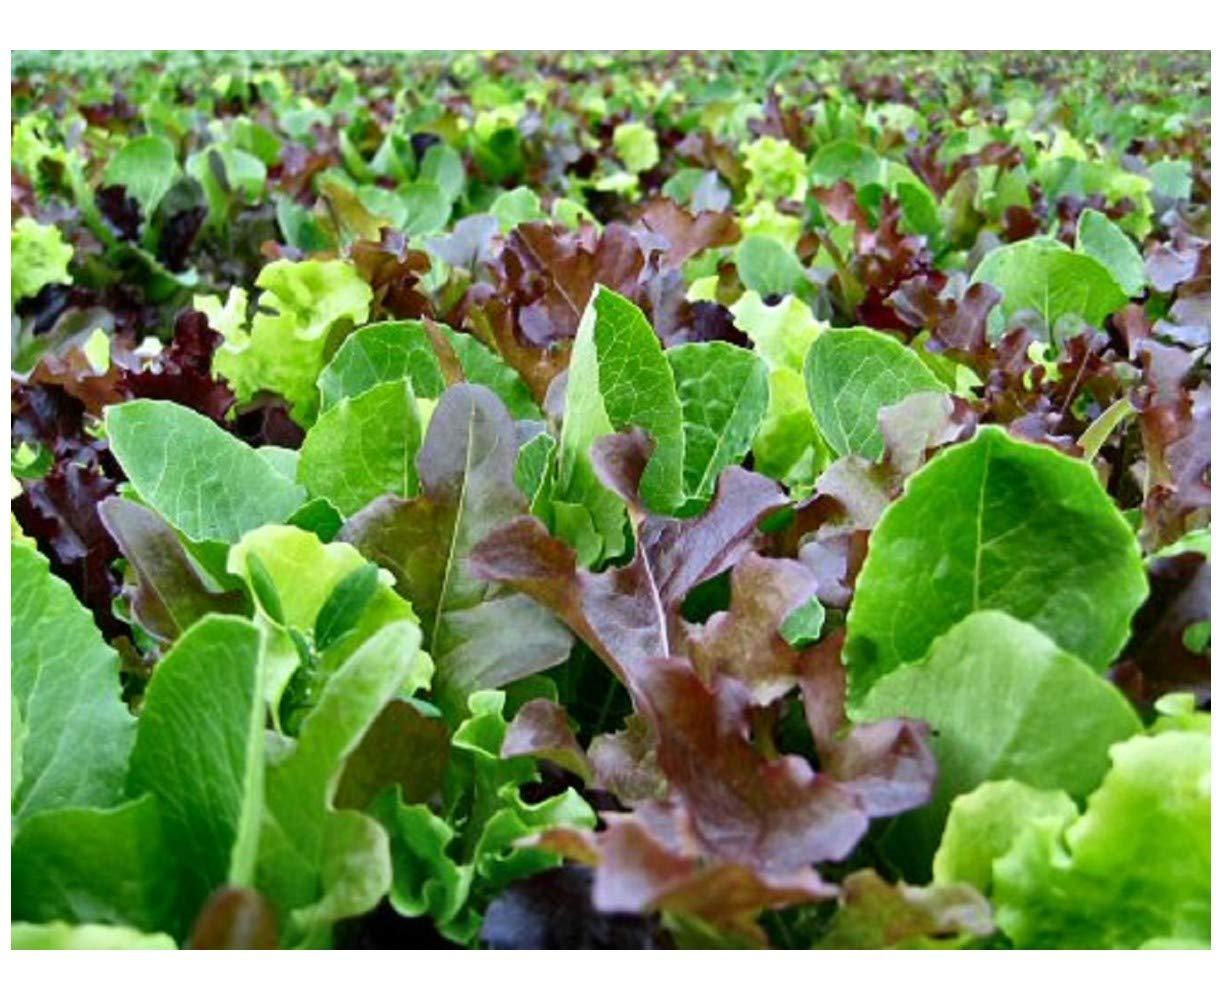 PREMIER SEEDS DIRECT - Lettuce - Mixed Leaf - MESCLUN Mix - 2500 Seeds